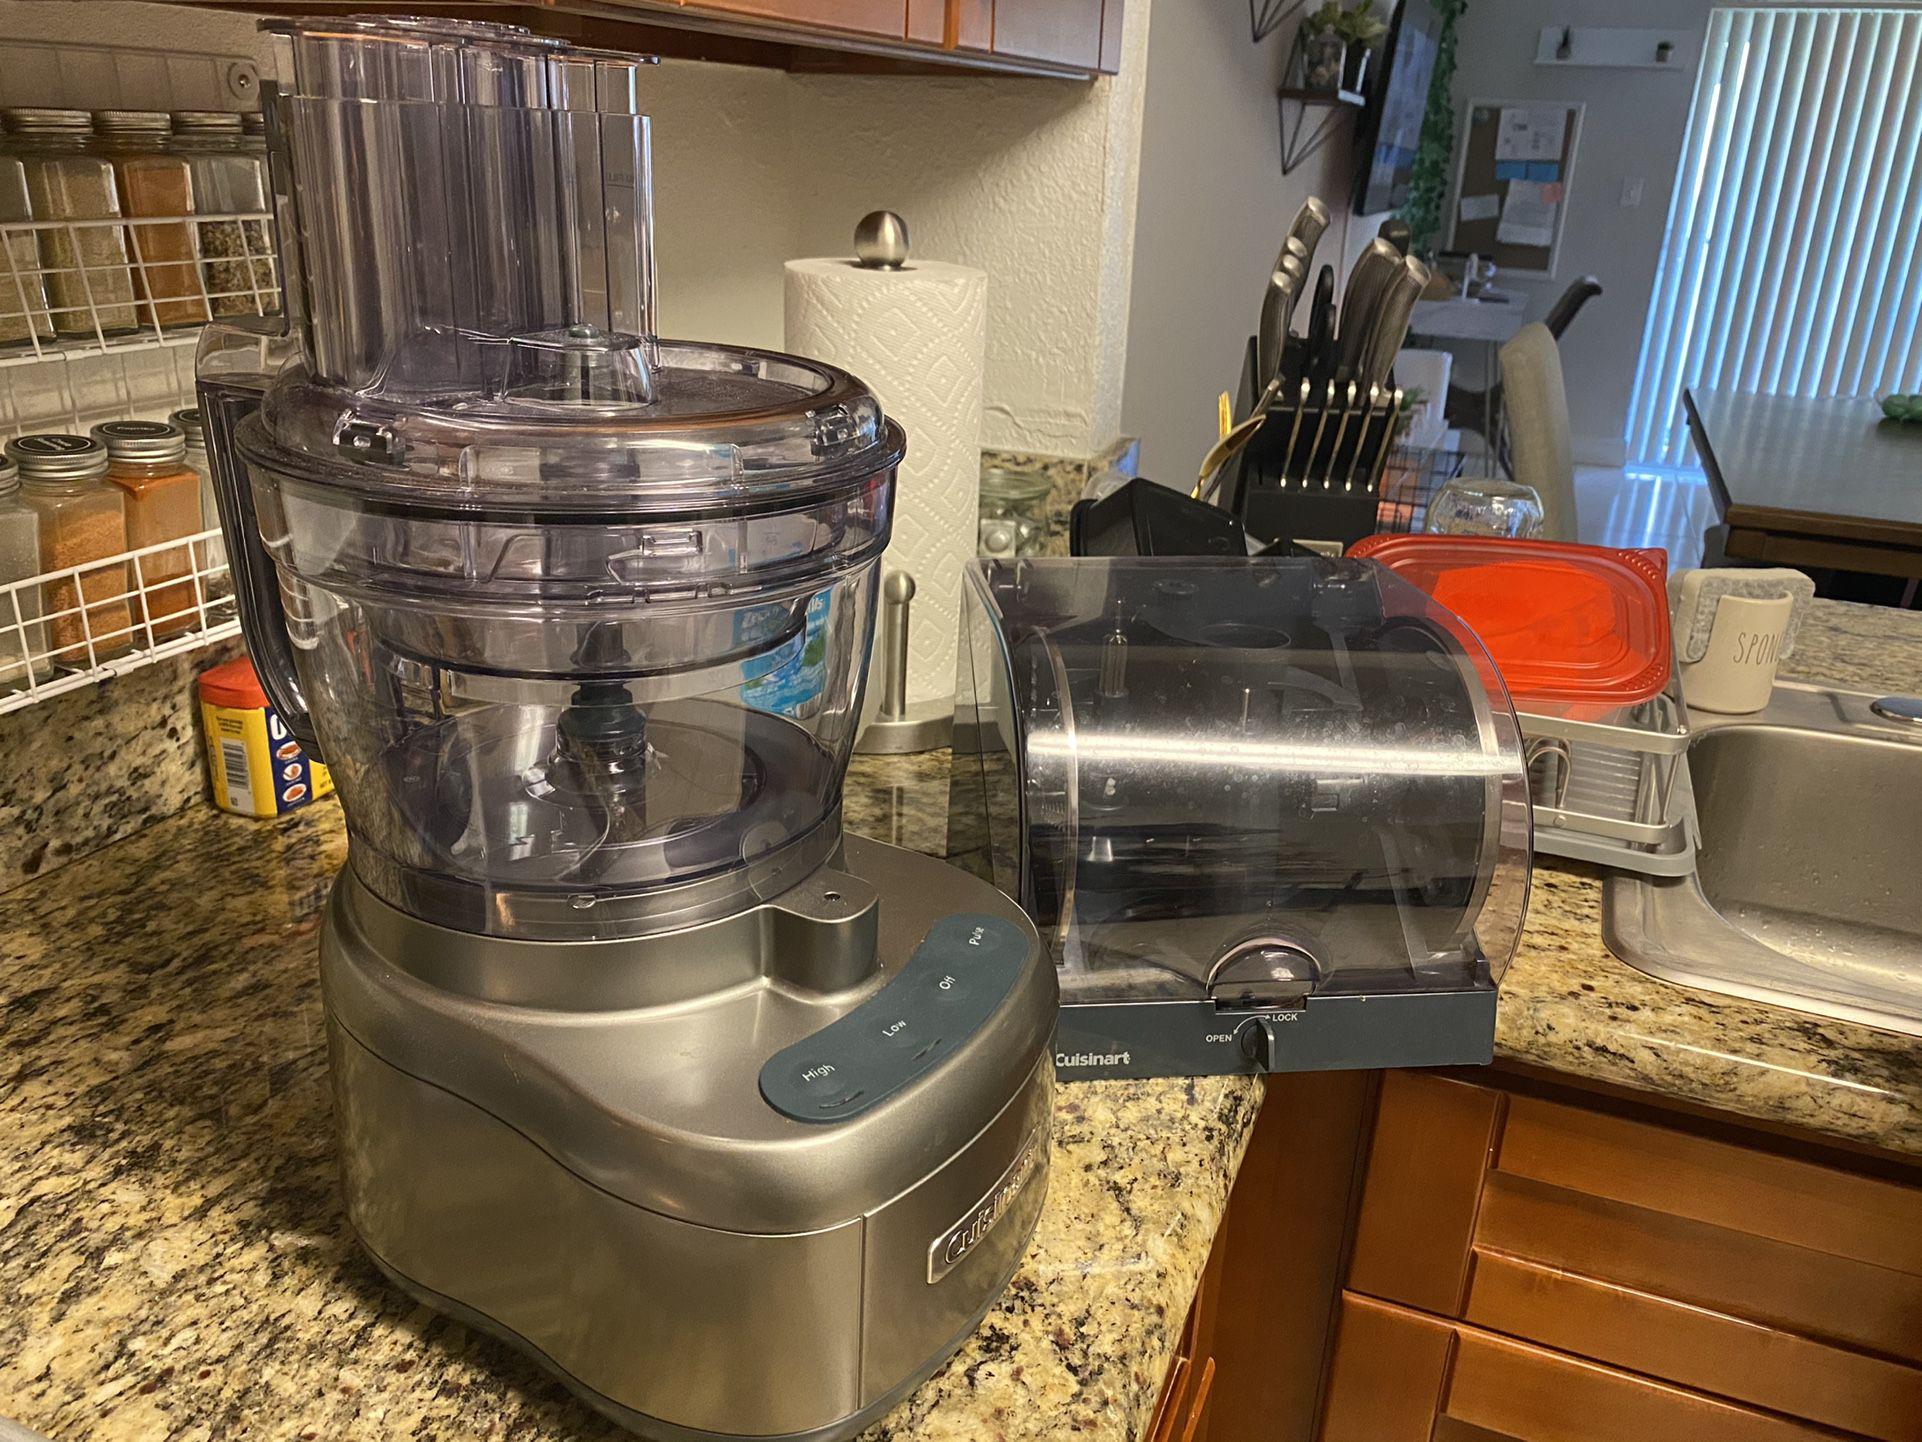 Cuisinart 13-cup Electric Food Processor